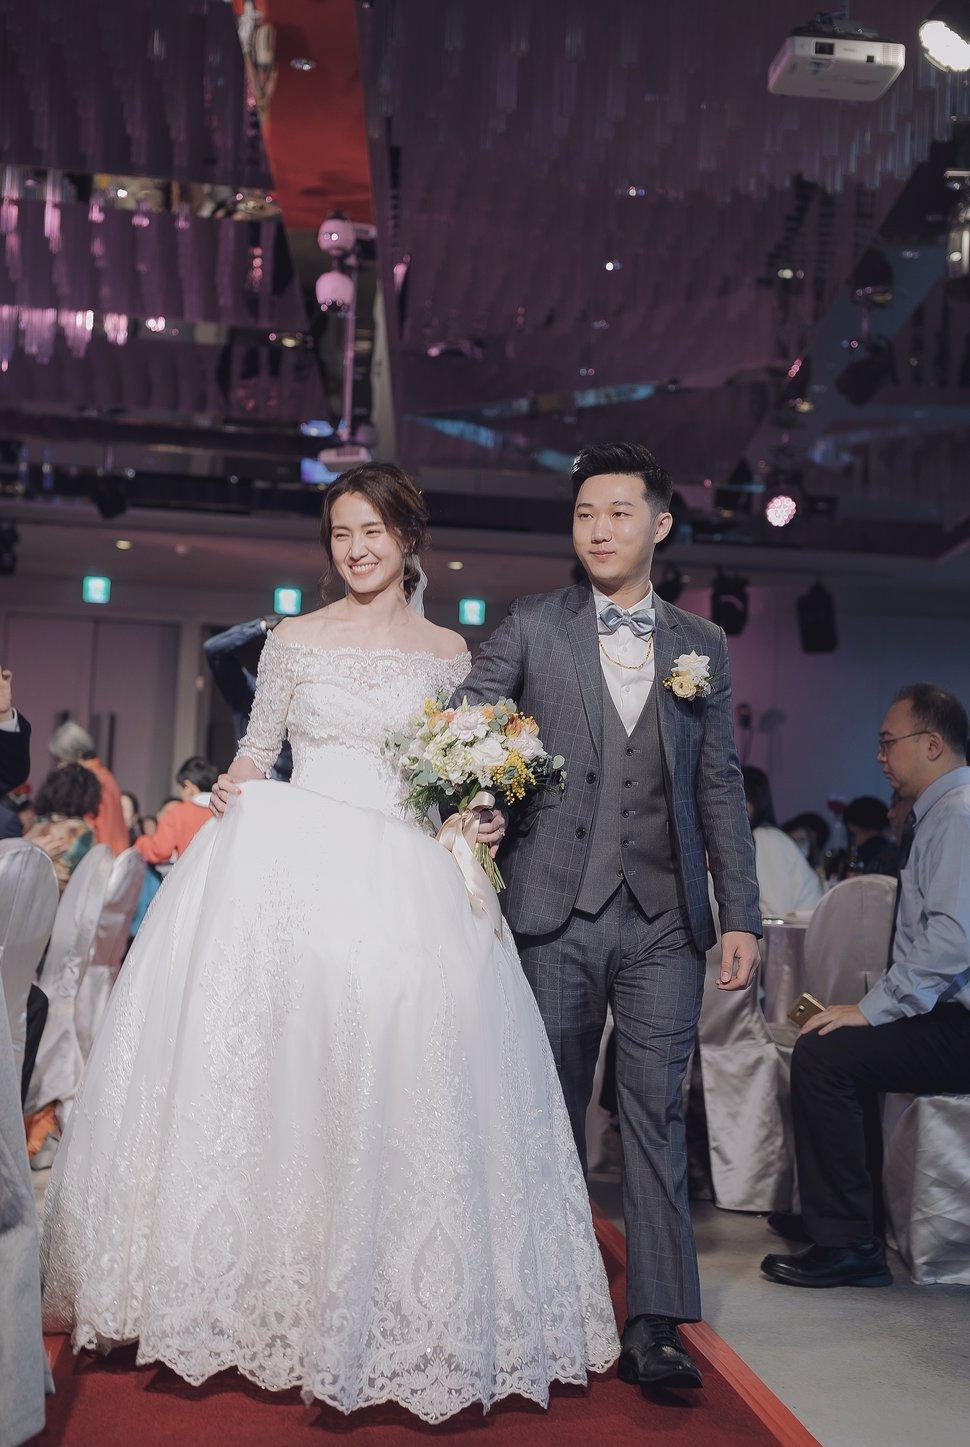 wedding-690 - J-Love 婚禮攝影團隊《結婚吧》